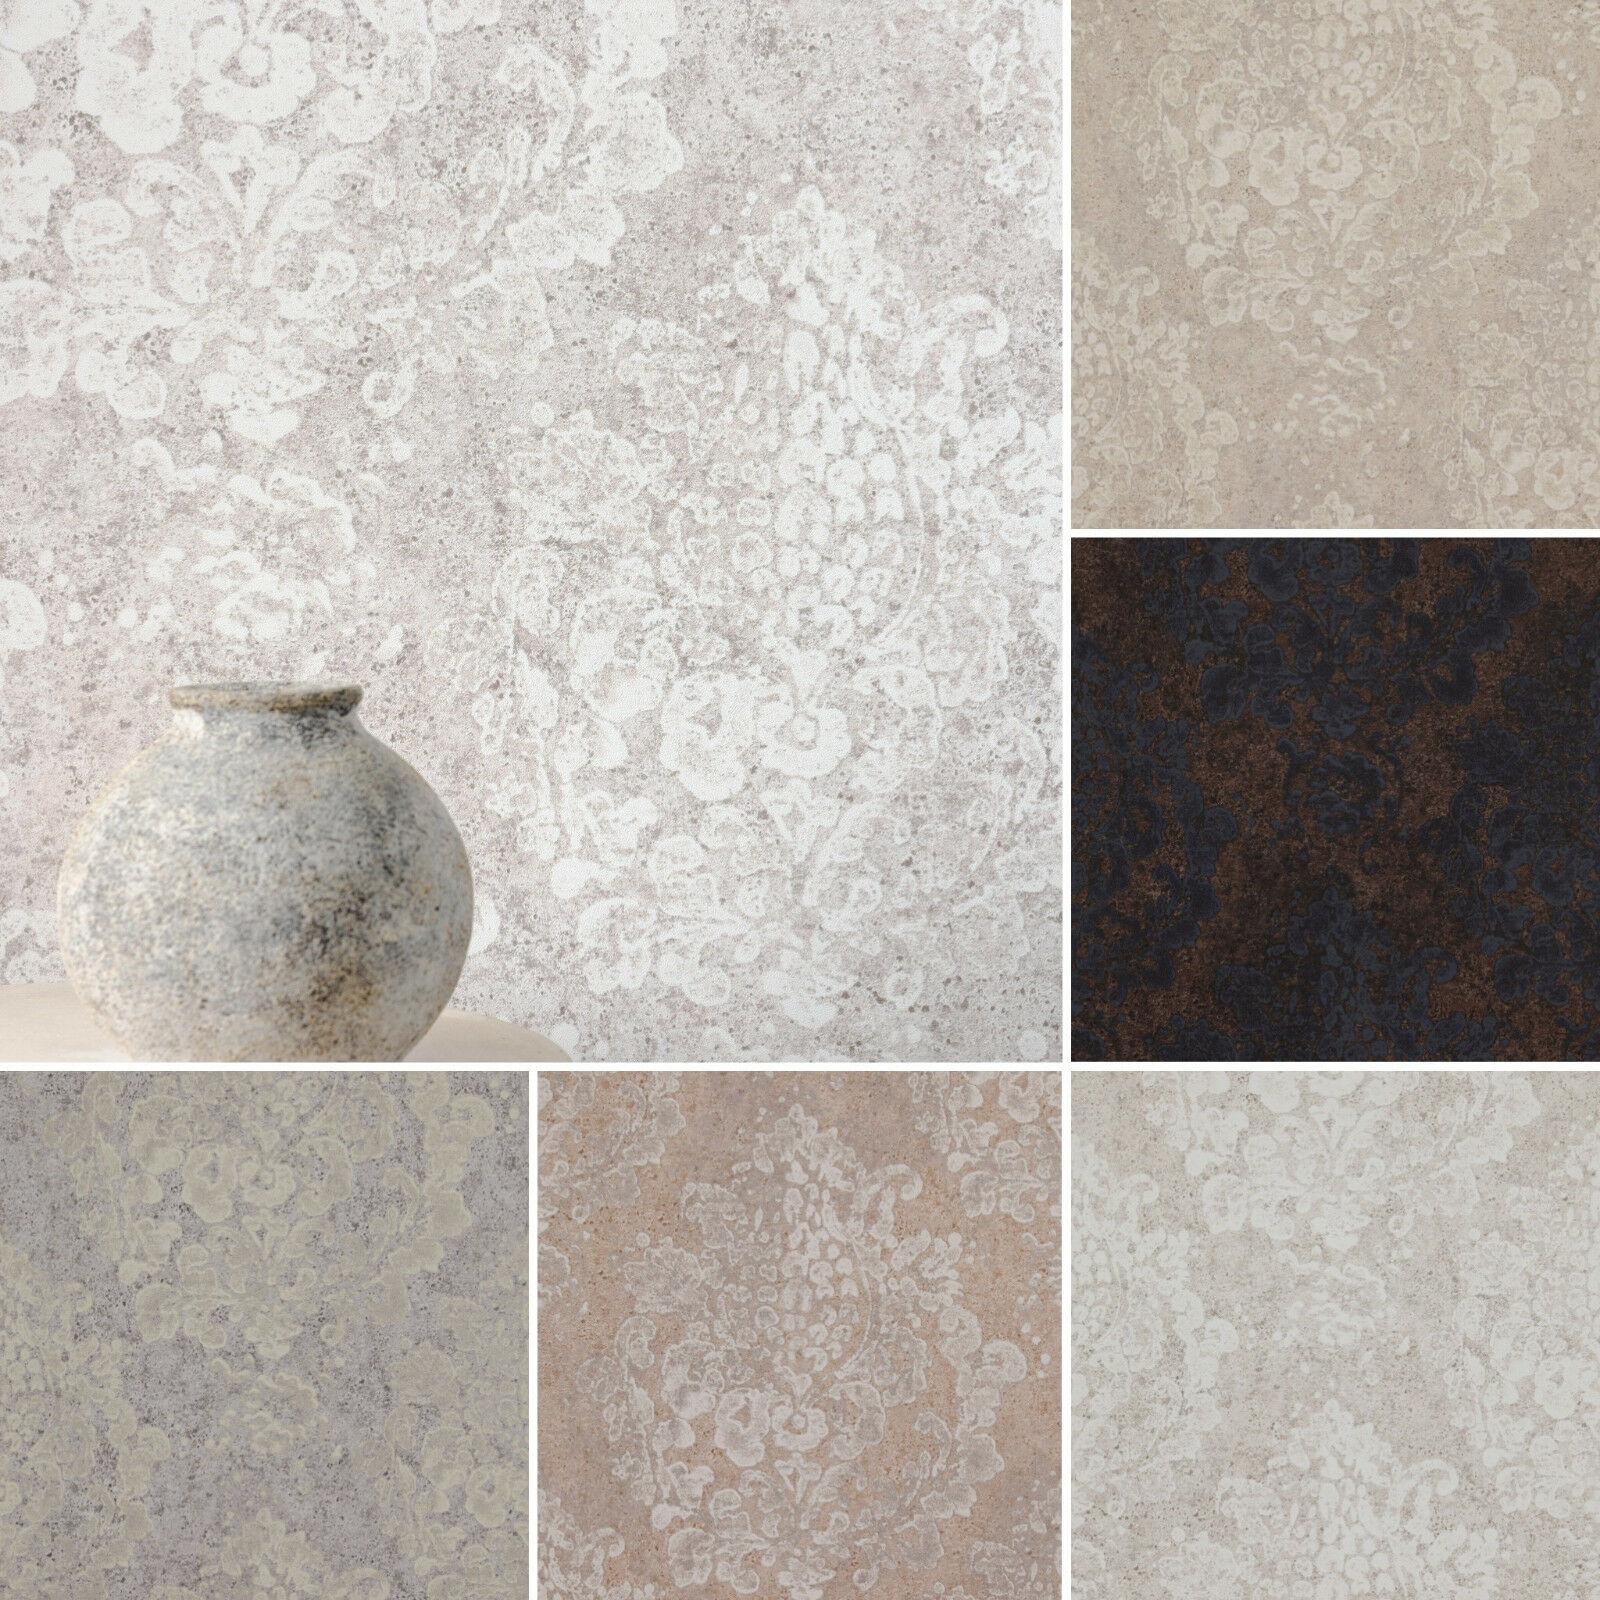 vlies tapete neo barock ornament stein beton optik beige braun grau